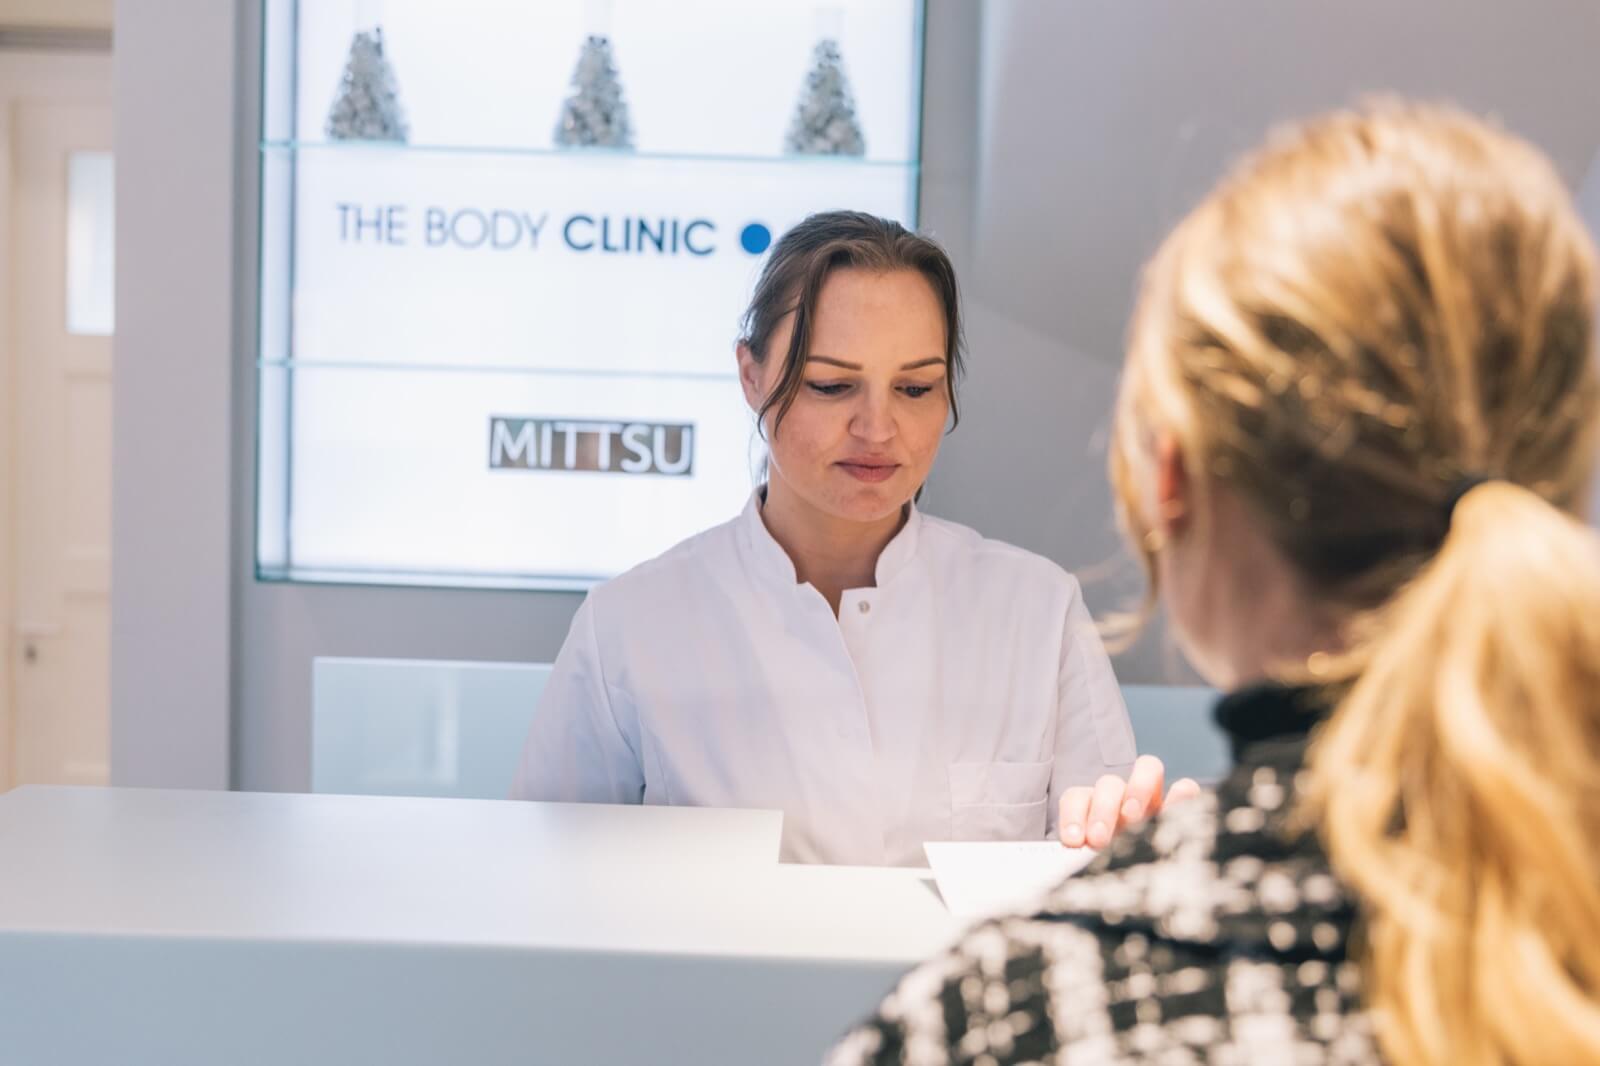 irene klein body clinic balie